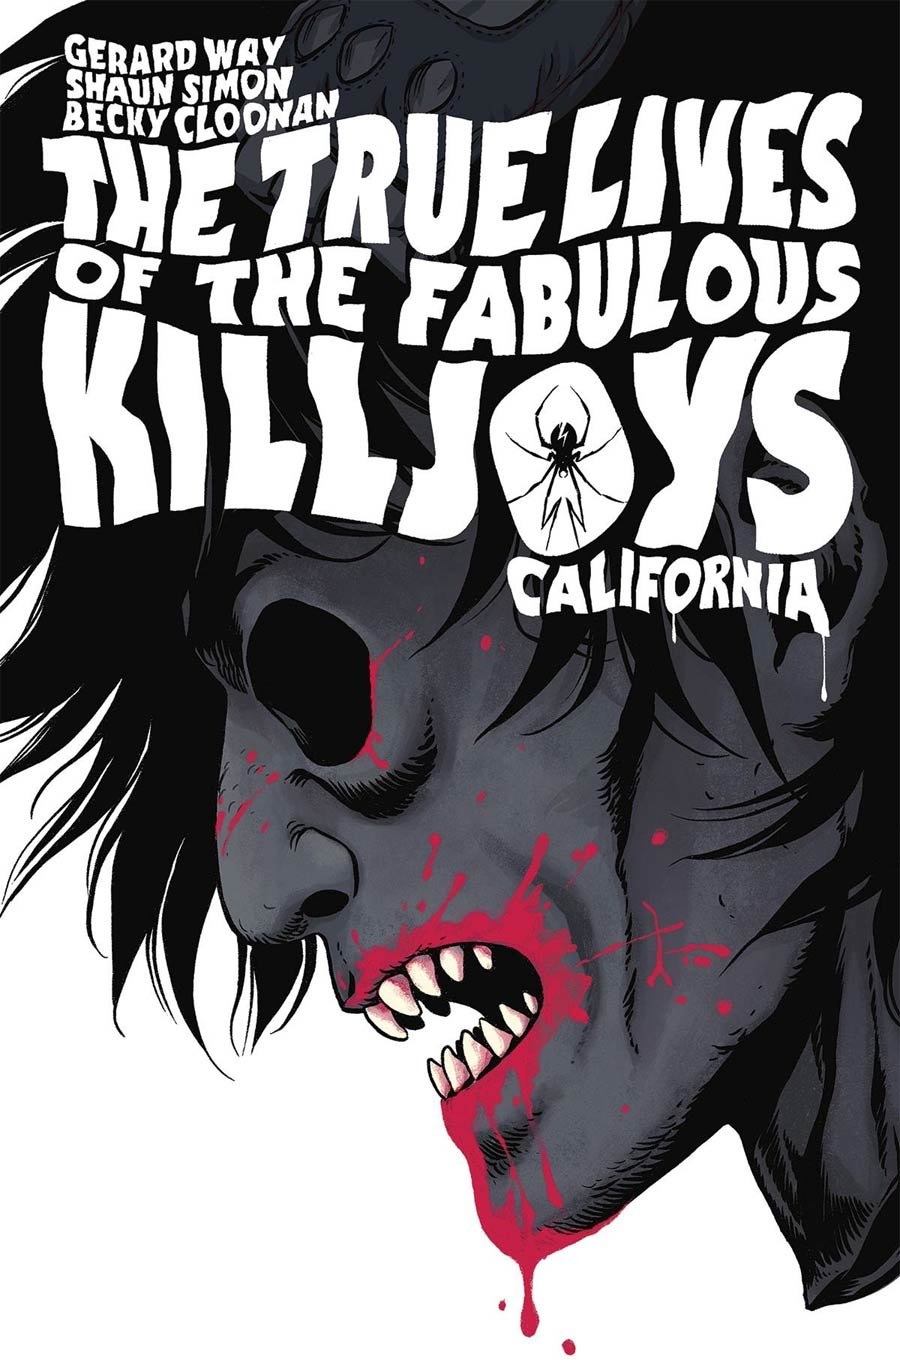 True Lives Of The Fabulous Killjoys California Library Edition HC